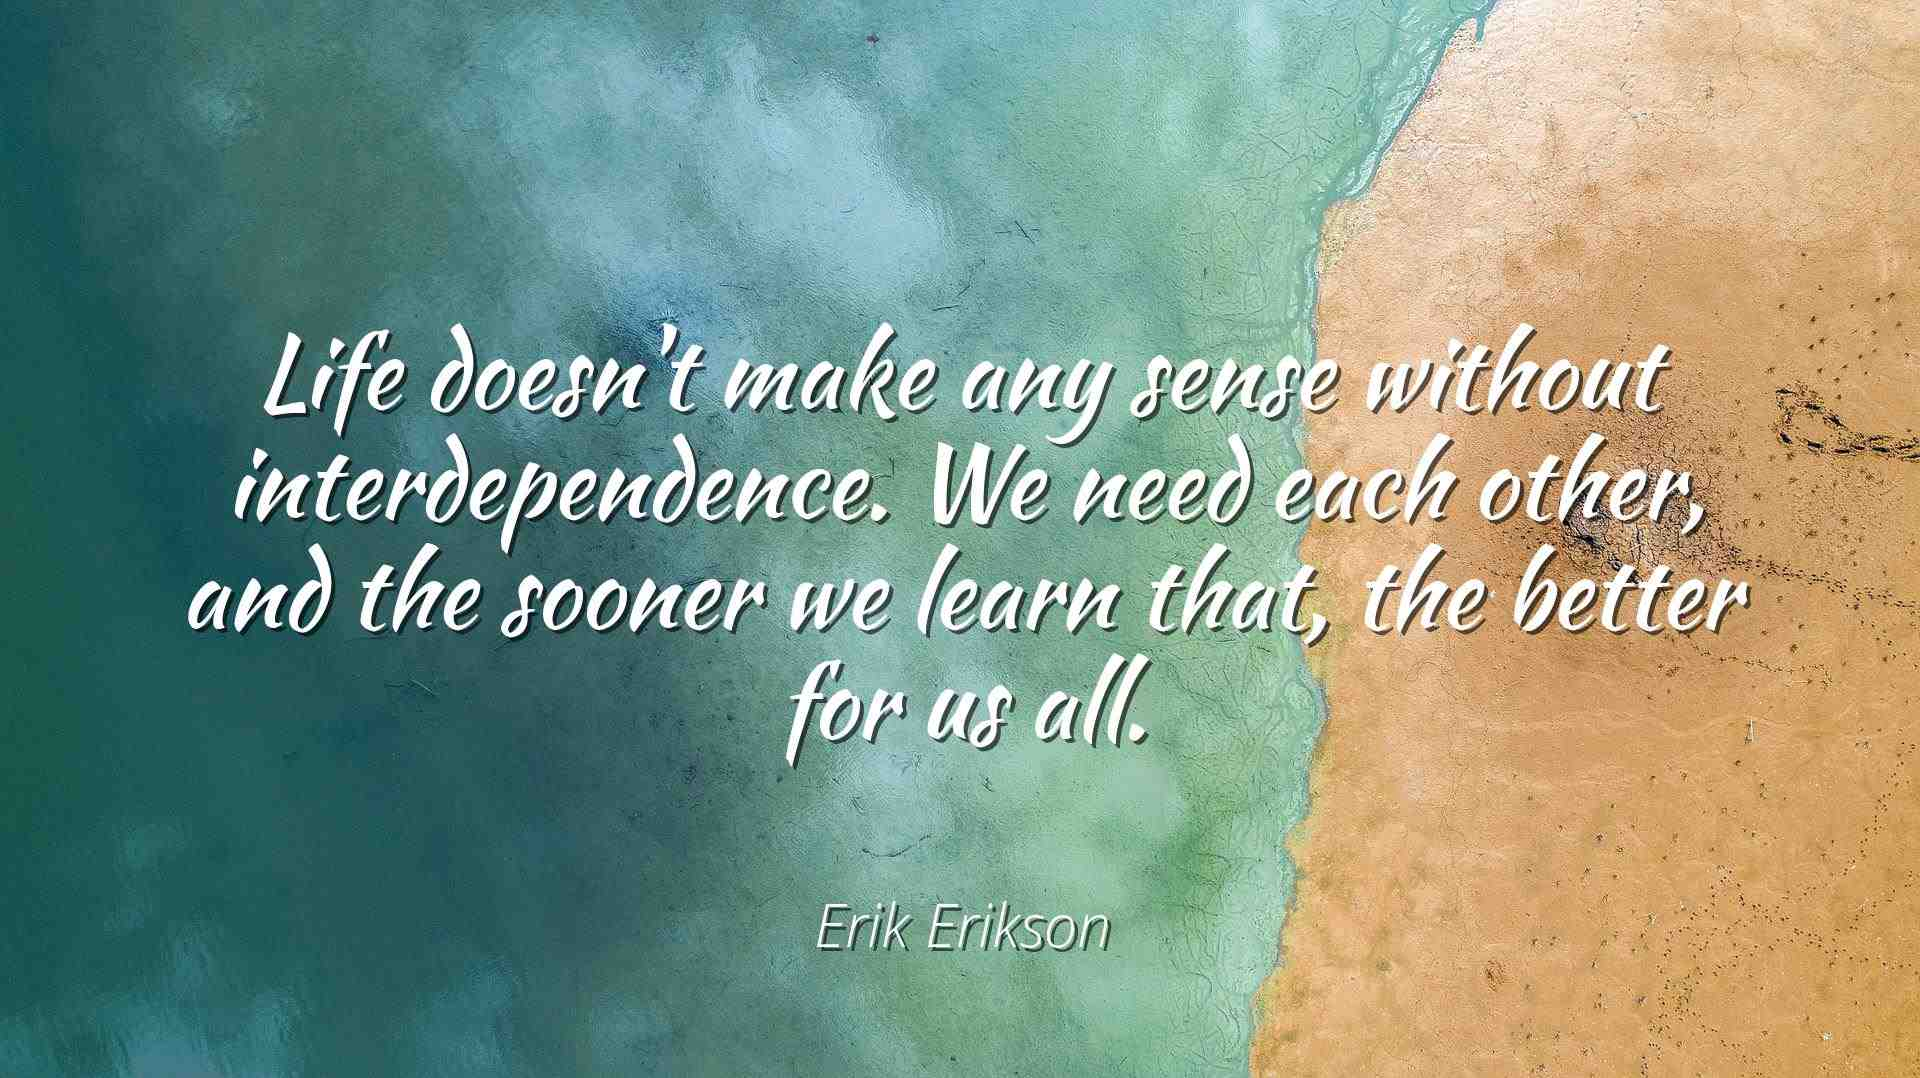 Erik Erikson Famous Quotes Laminated Poster Print 24x20 Life